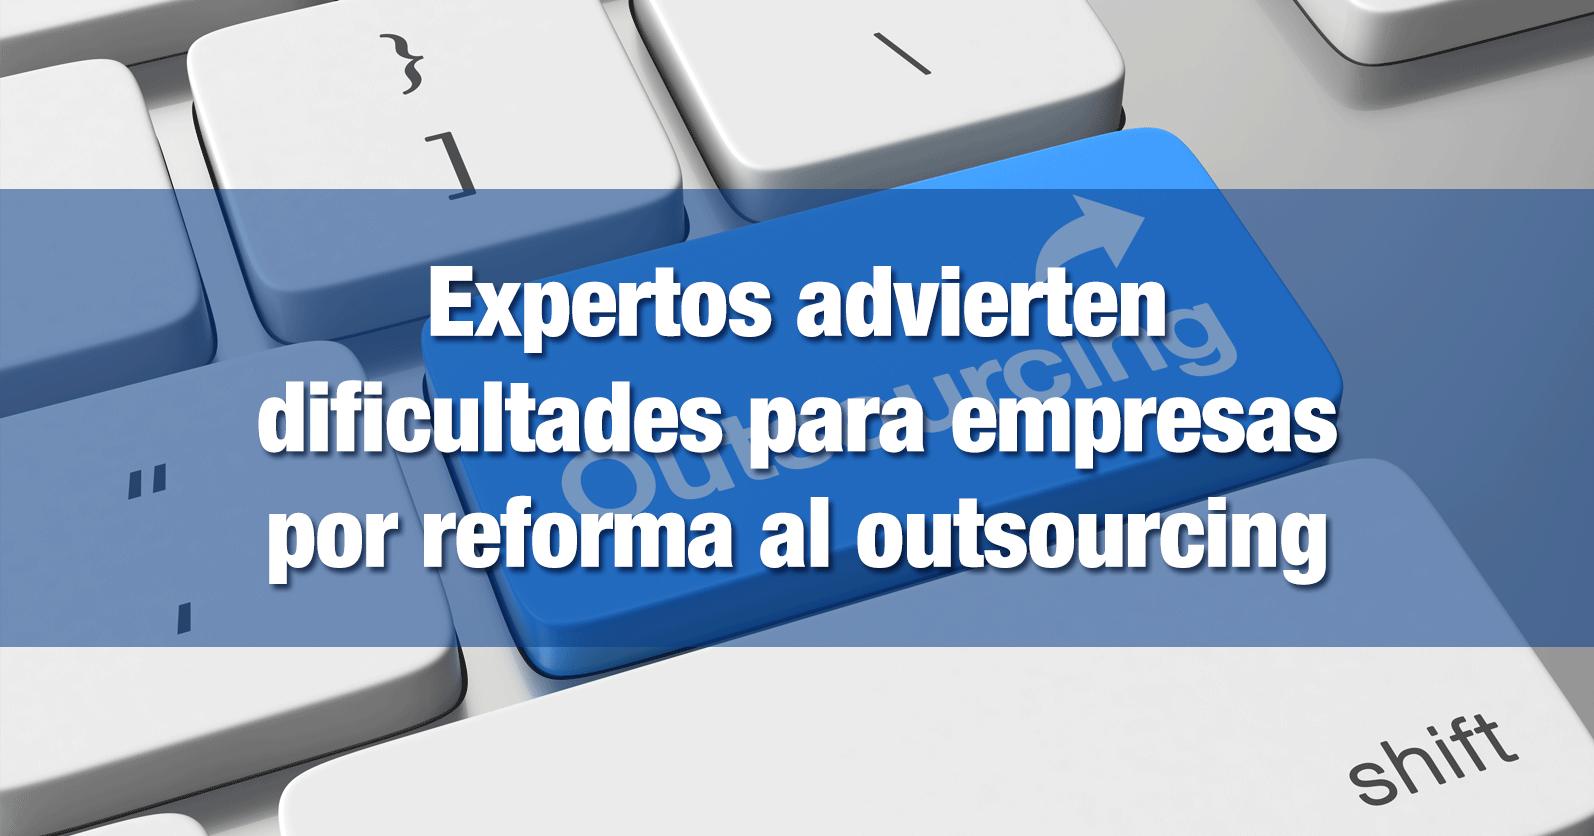 Expertos advierten dificultades para empresas por reforma al outsourcing